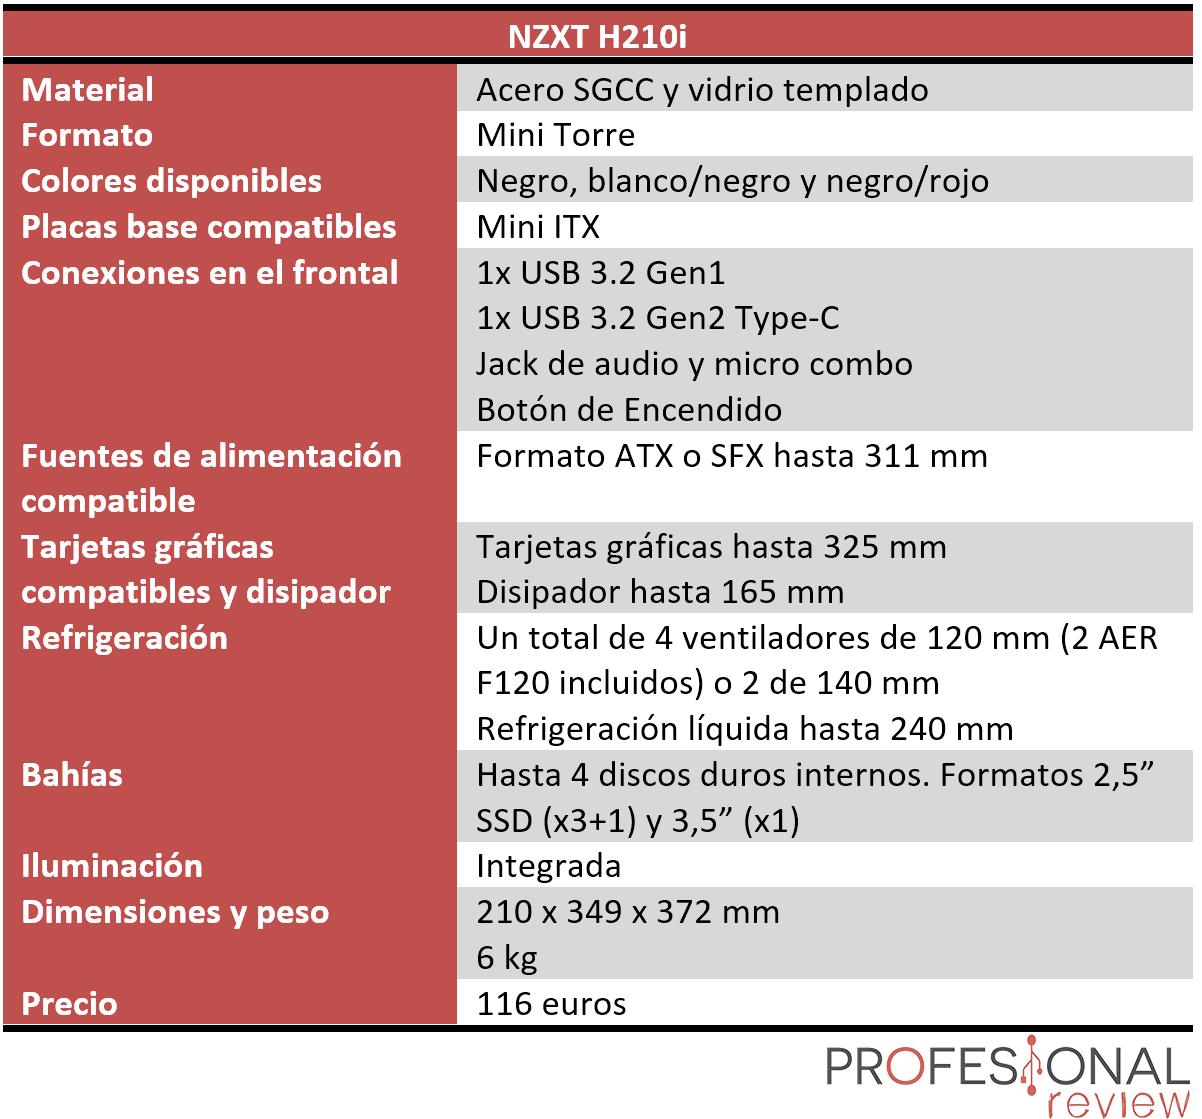 NZXT H210i Características